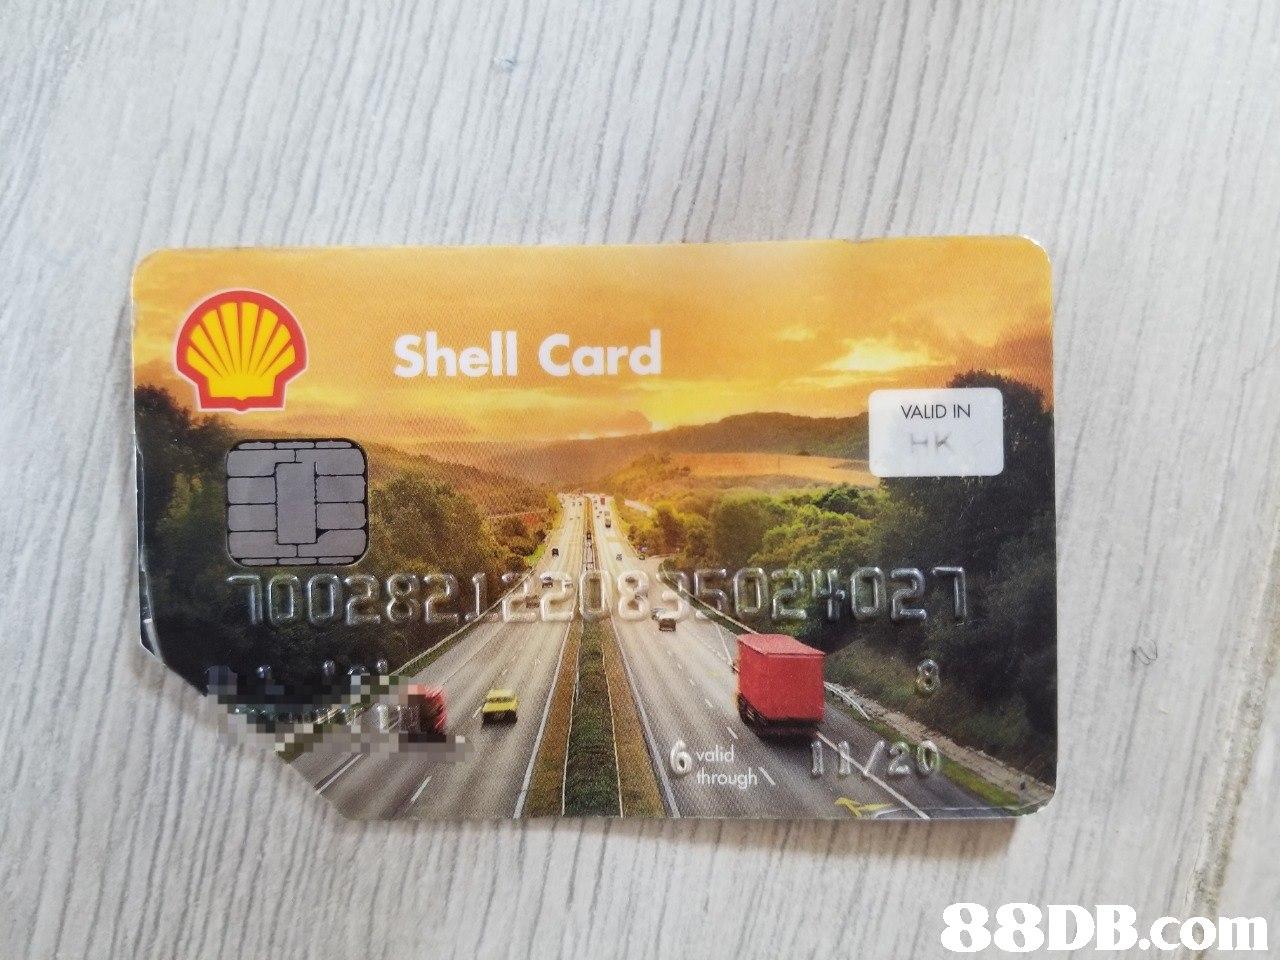 Shell Card VALID IN 7002821 valid through\ 88DB.com